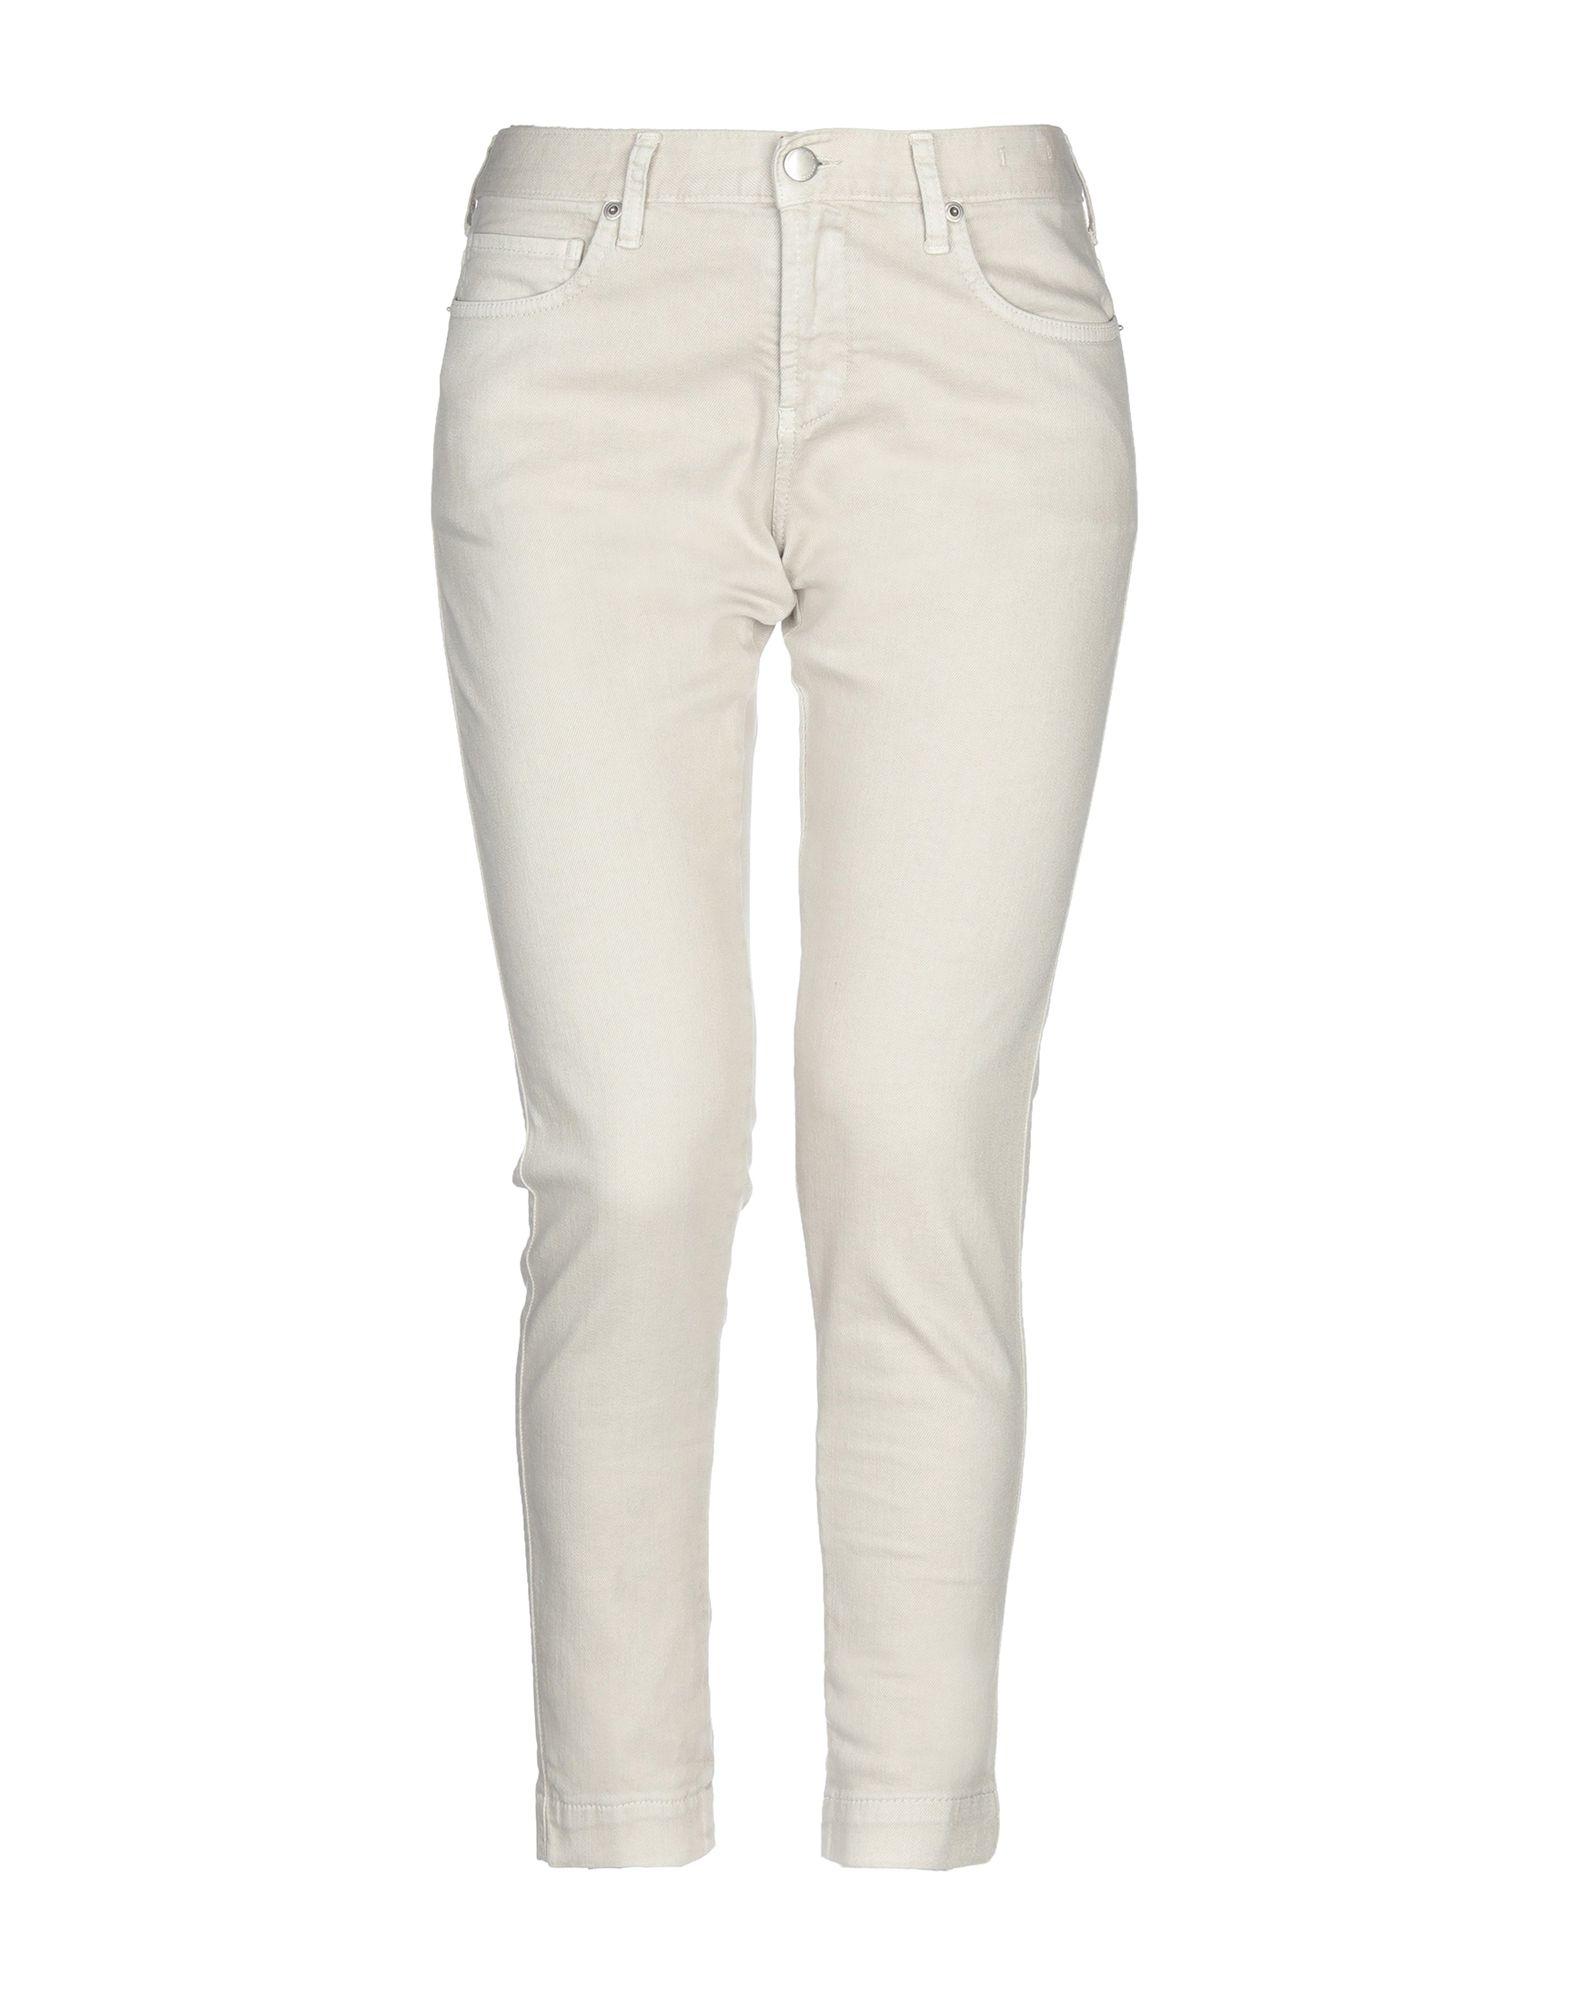 Фото - MASSIMO ALBA Джинсовые брюки-капри massimo e daniele брюки капри